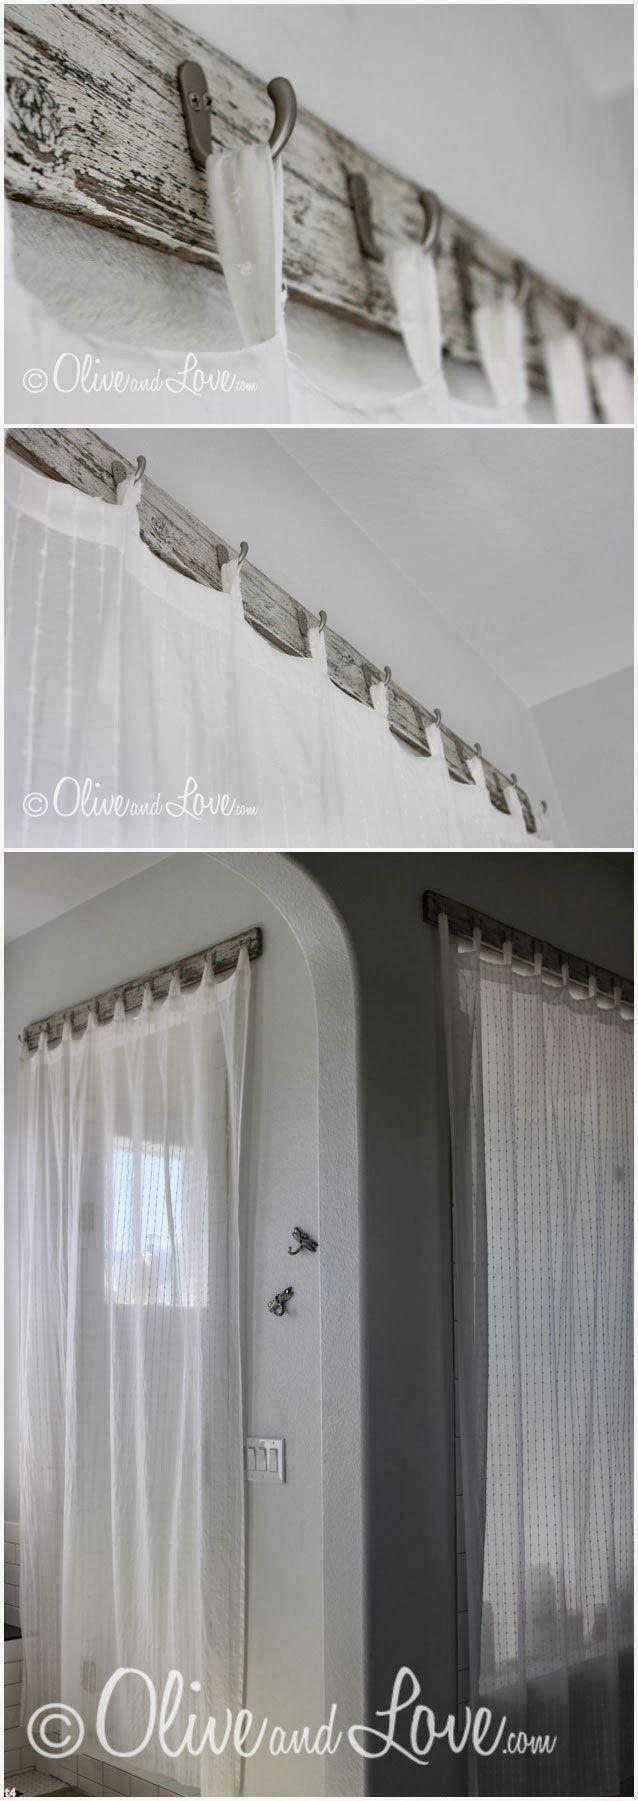 Alternative To A Curtain Rod